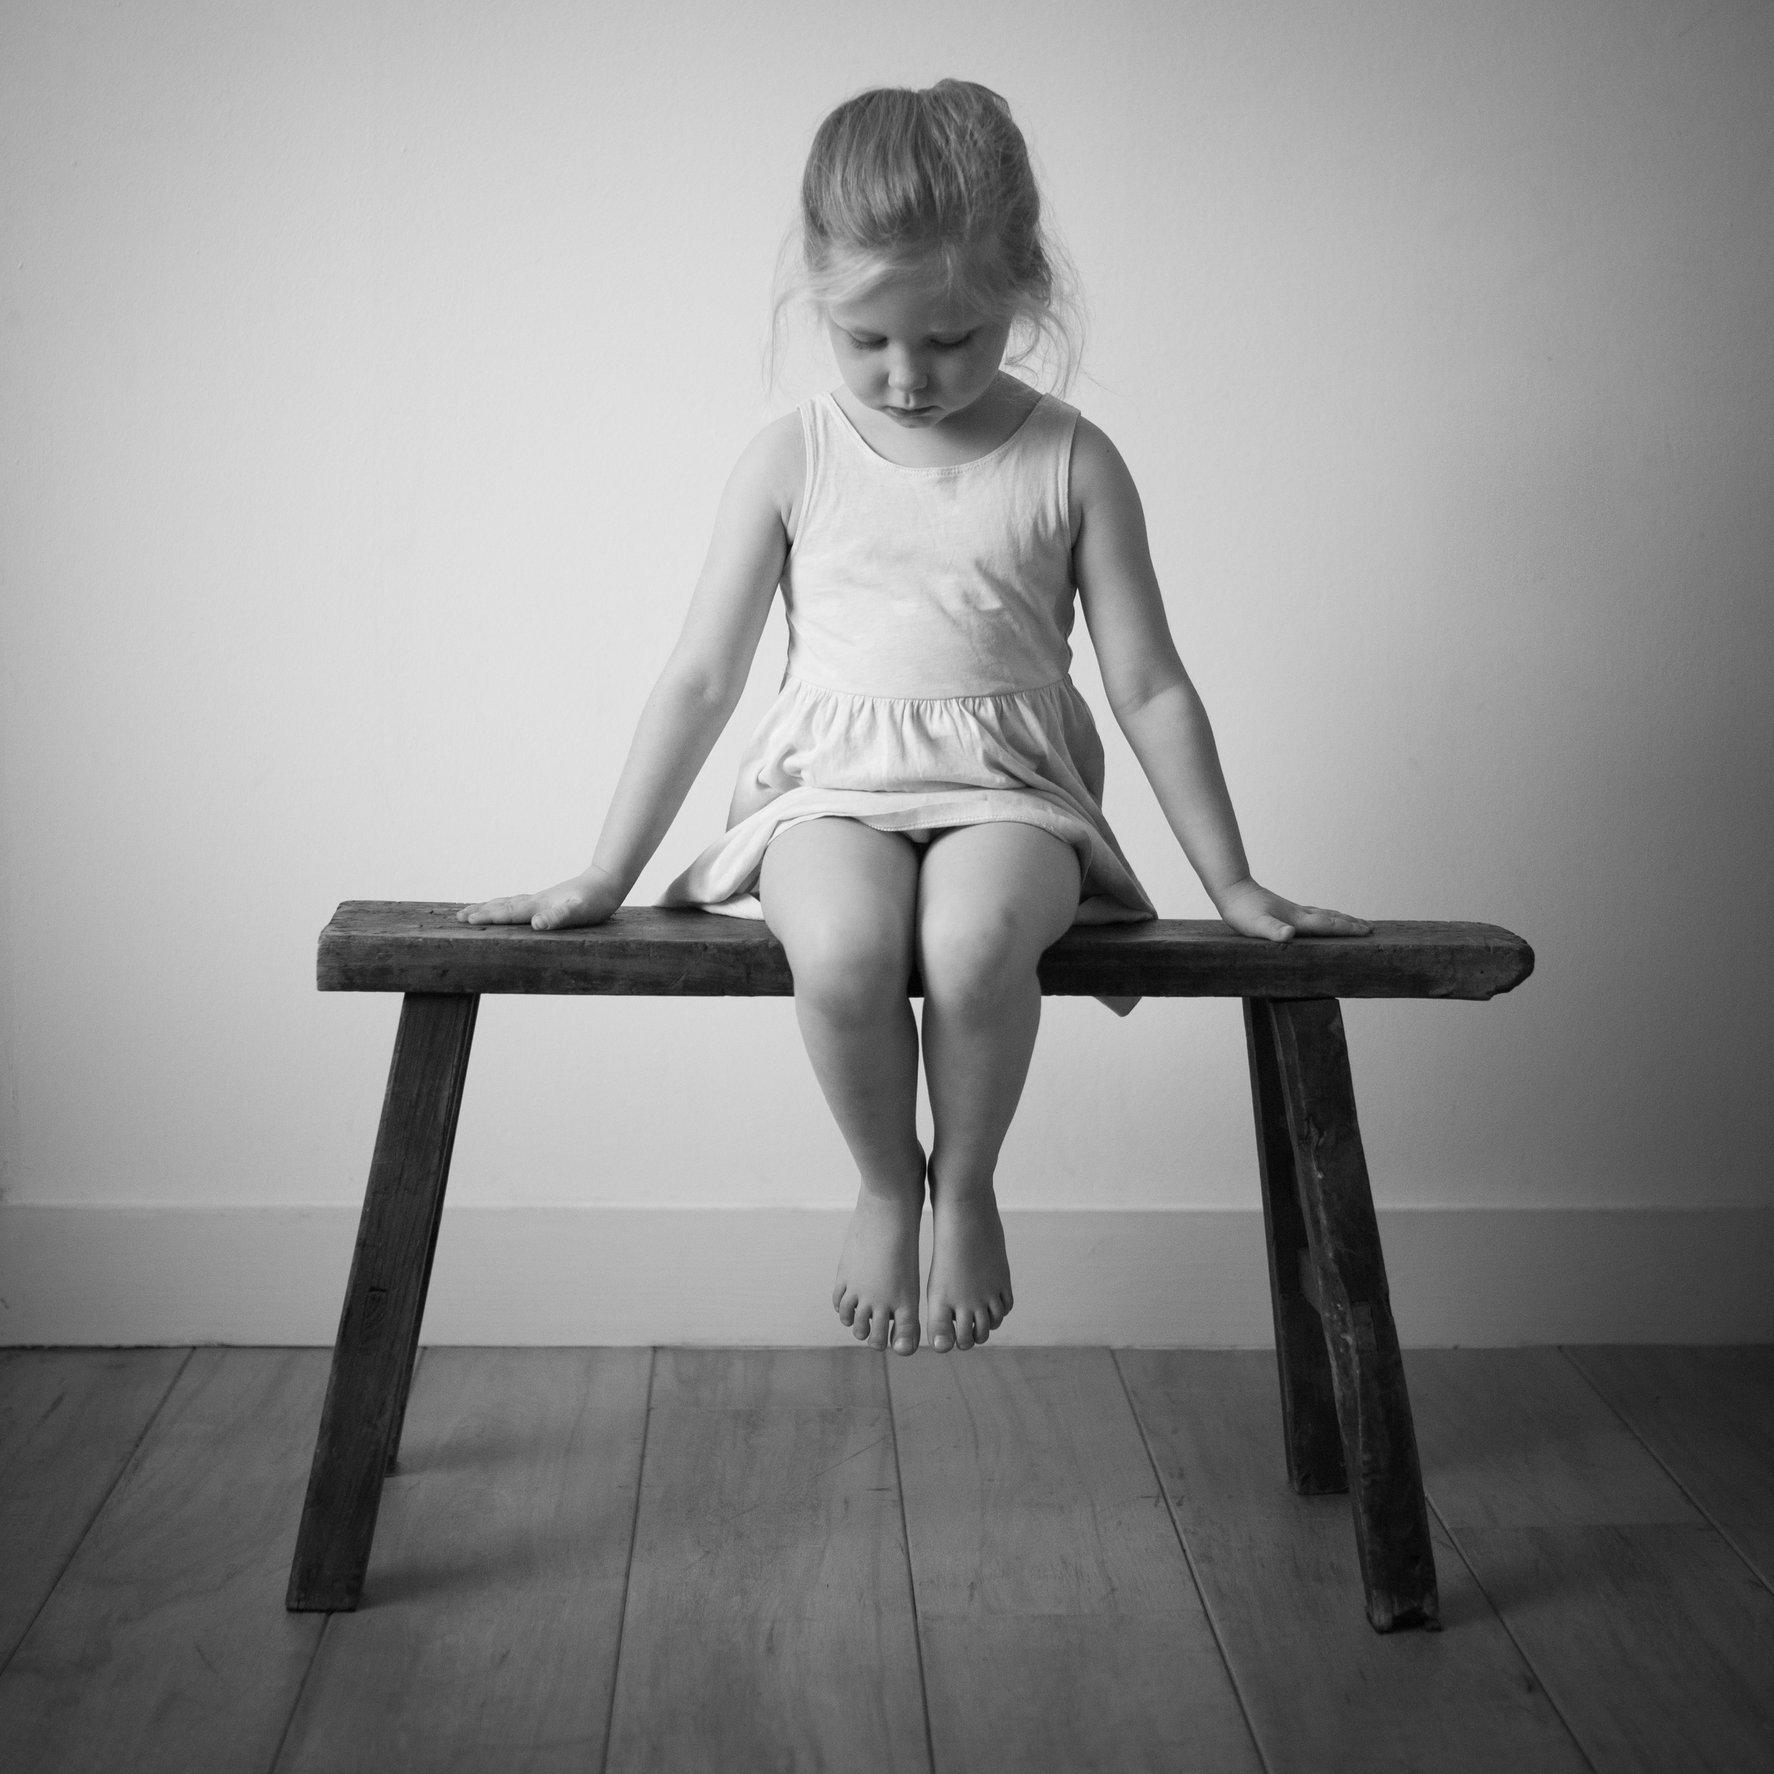 Portretfoto kind op bankje